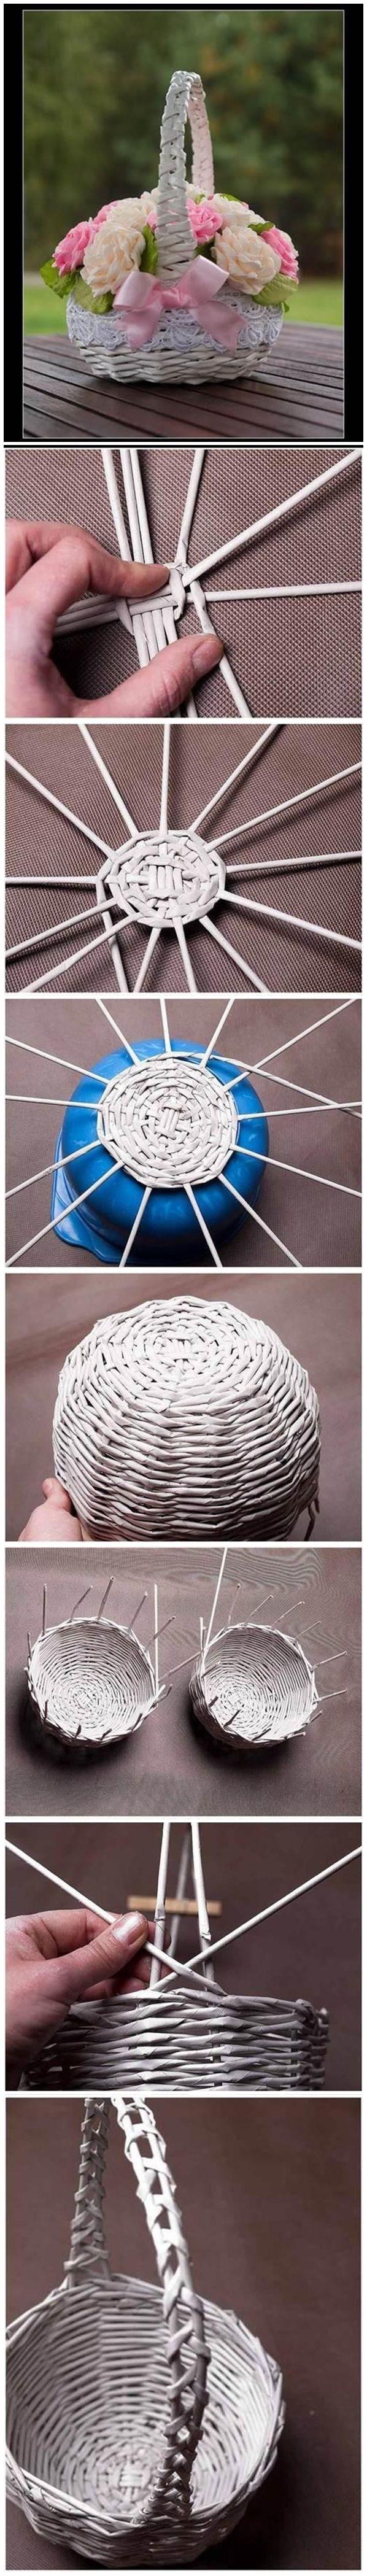 blasket-vert  a basket made with 'newspaper tubes'